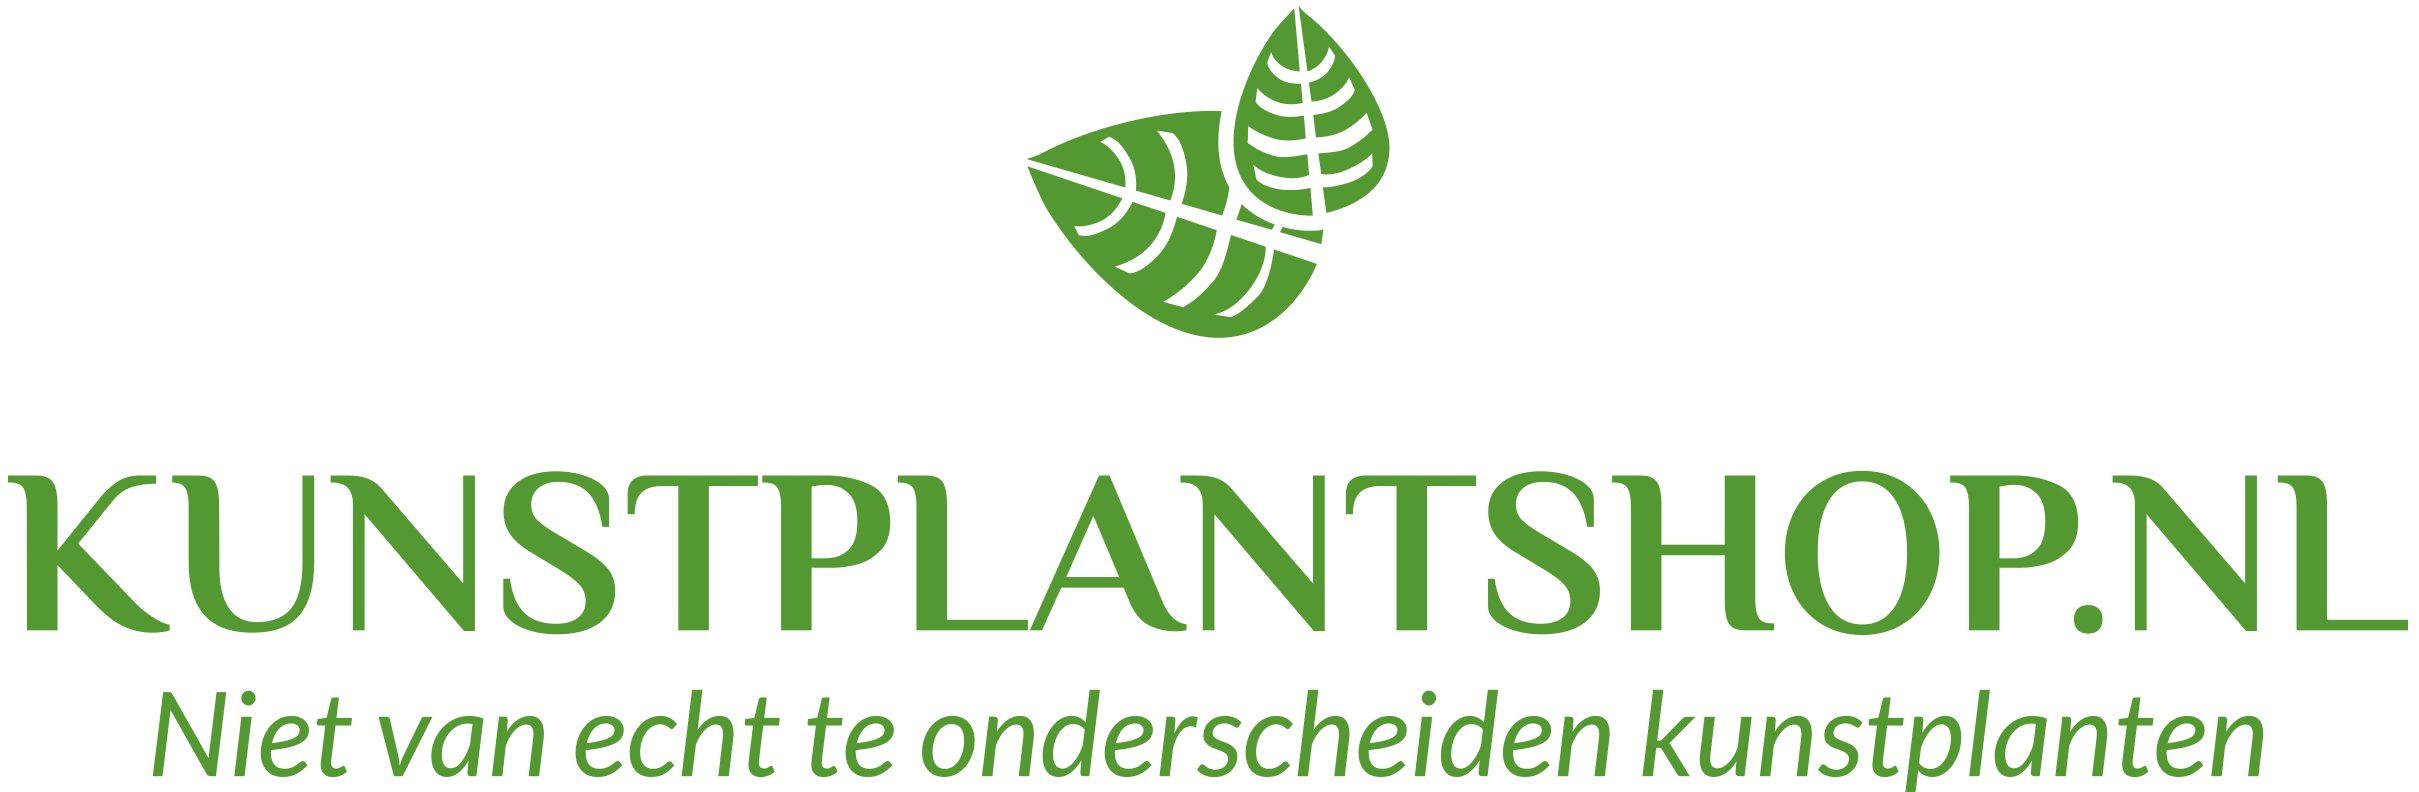 Kunstplantshop.nl